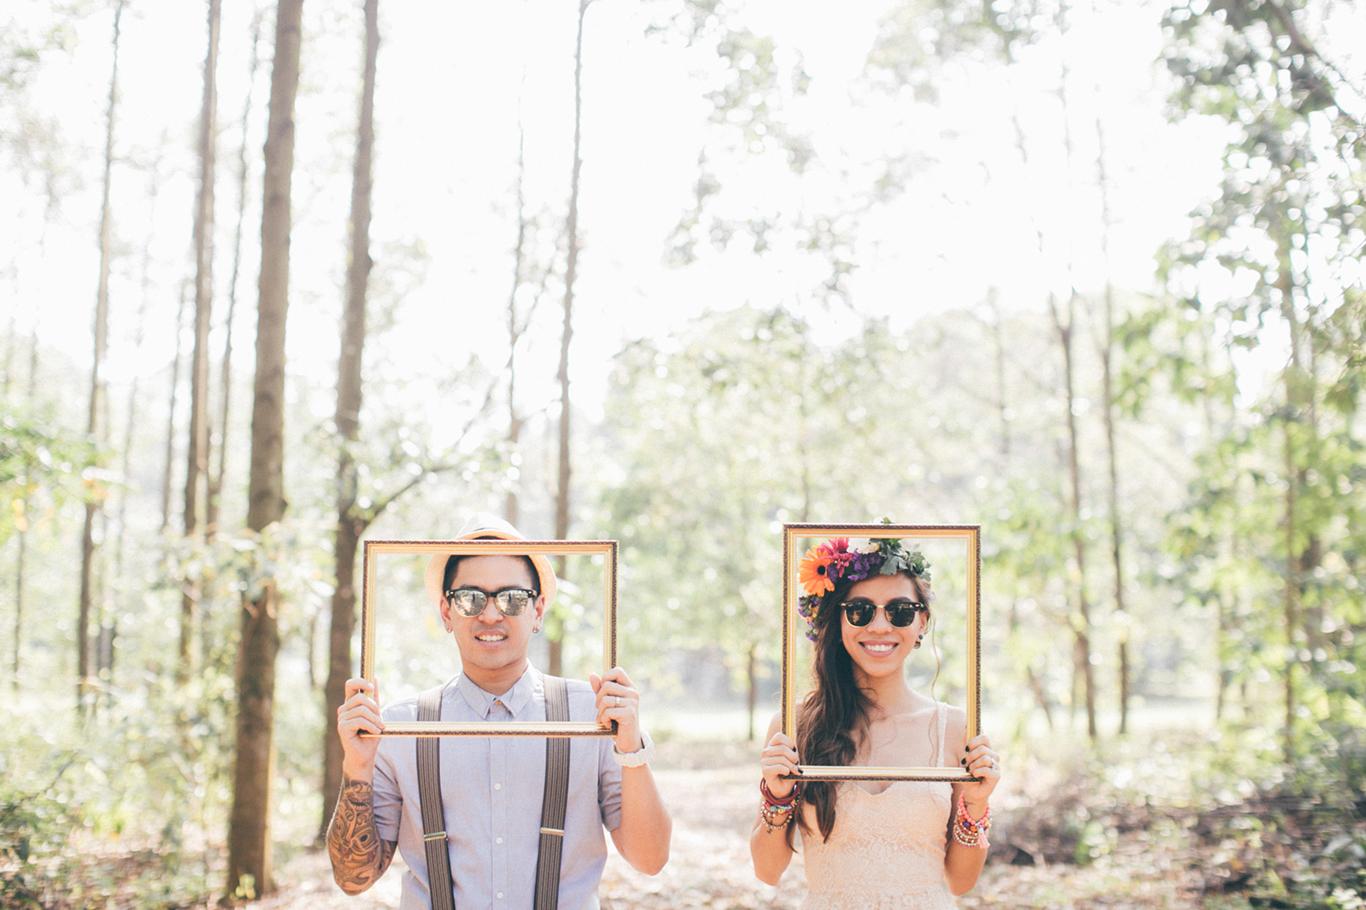 23-hellojanelee-boho-prewedding-malaysia